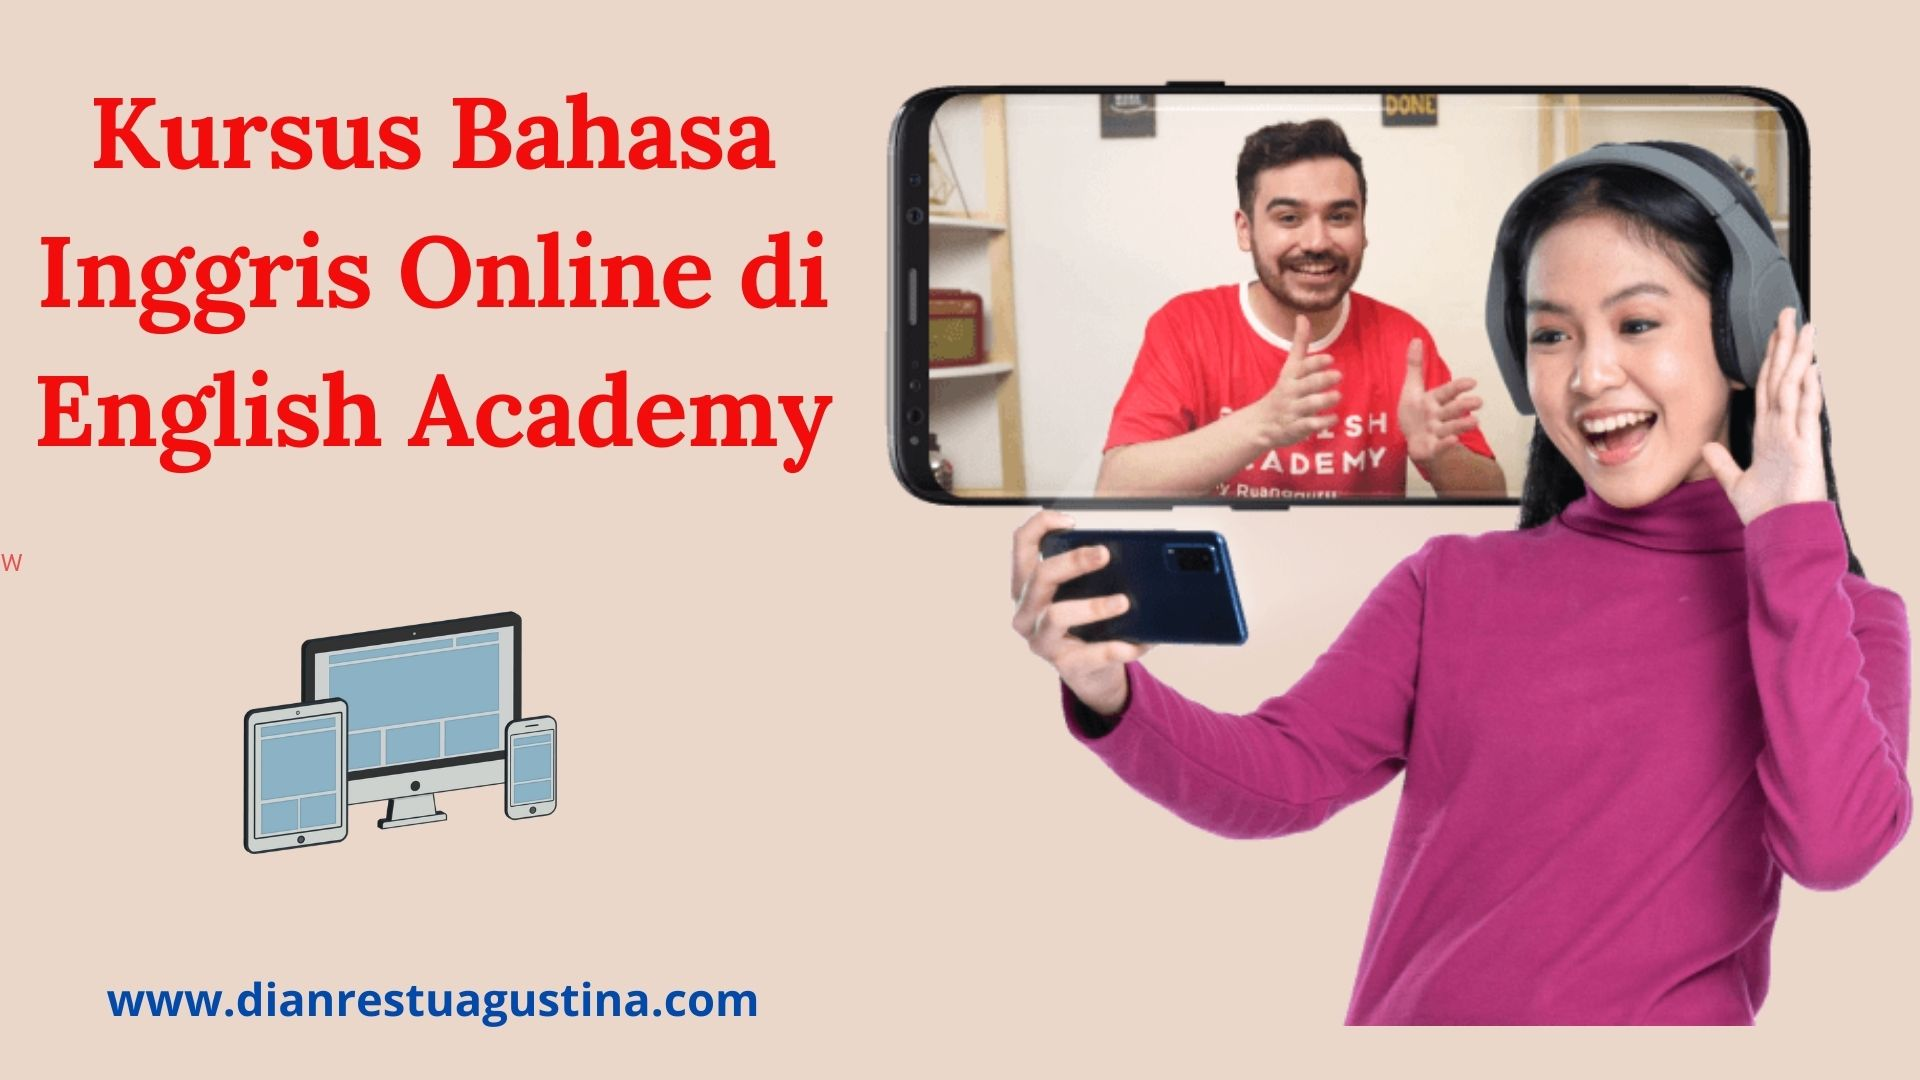 Kursus Bahasa Inggris Online di English Academy